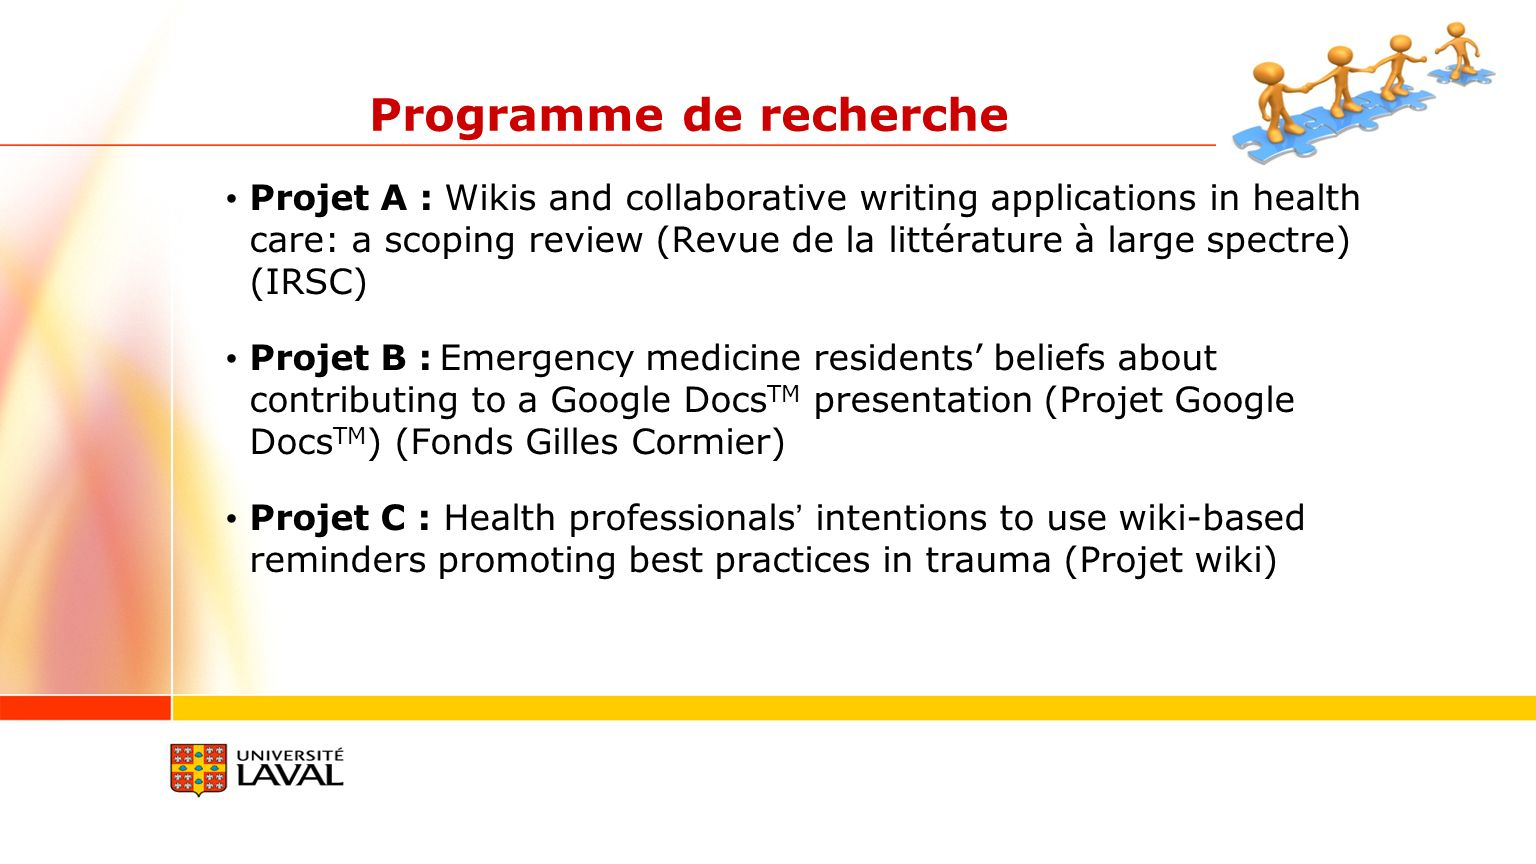 Projet A : Wikis and collaborative writing applications in health care: a scoping review (Revue de la littérature à large spectre) (IRSC) Projet B : E